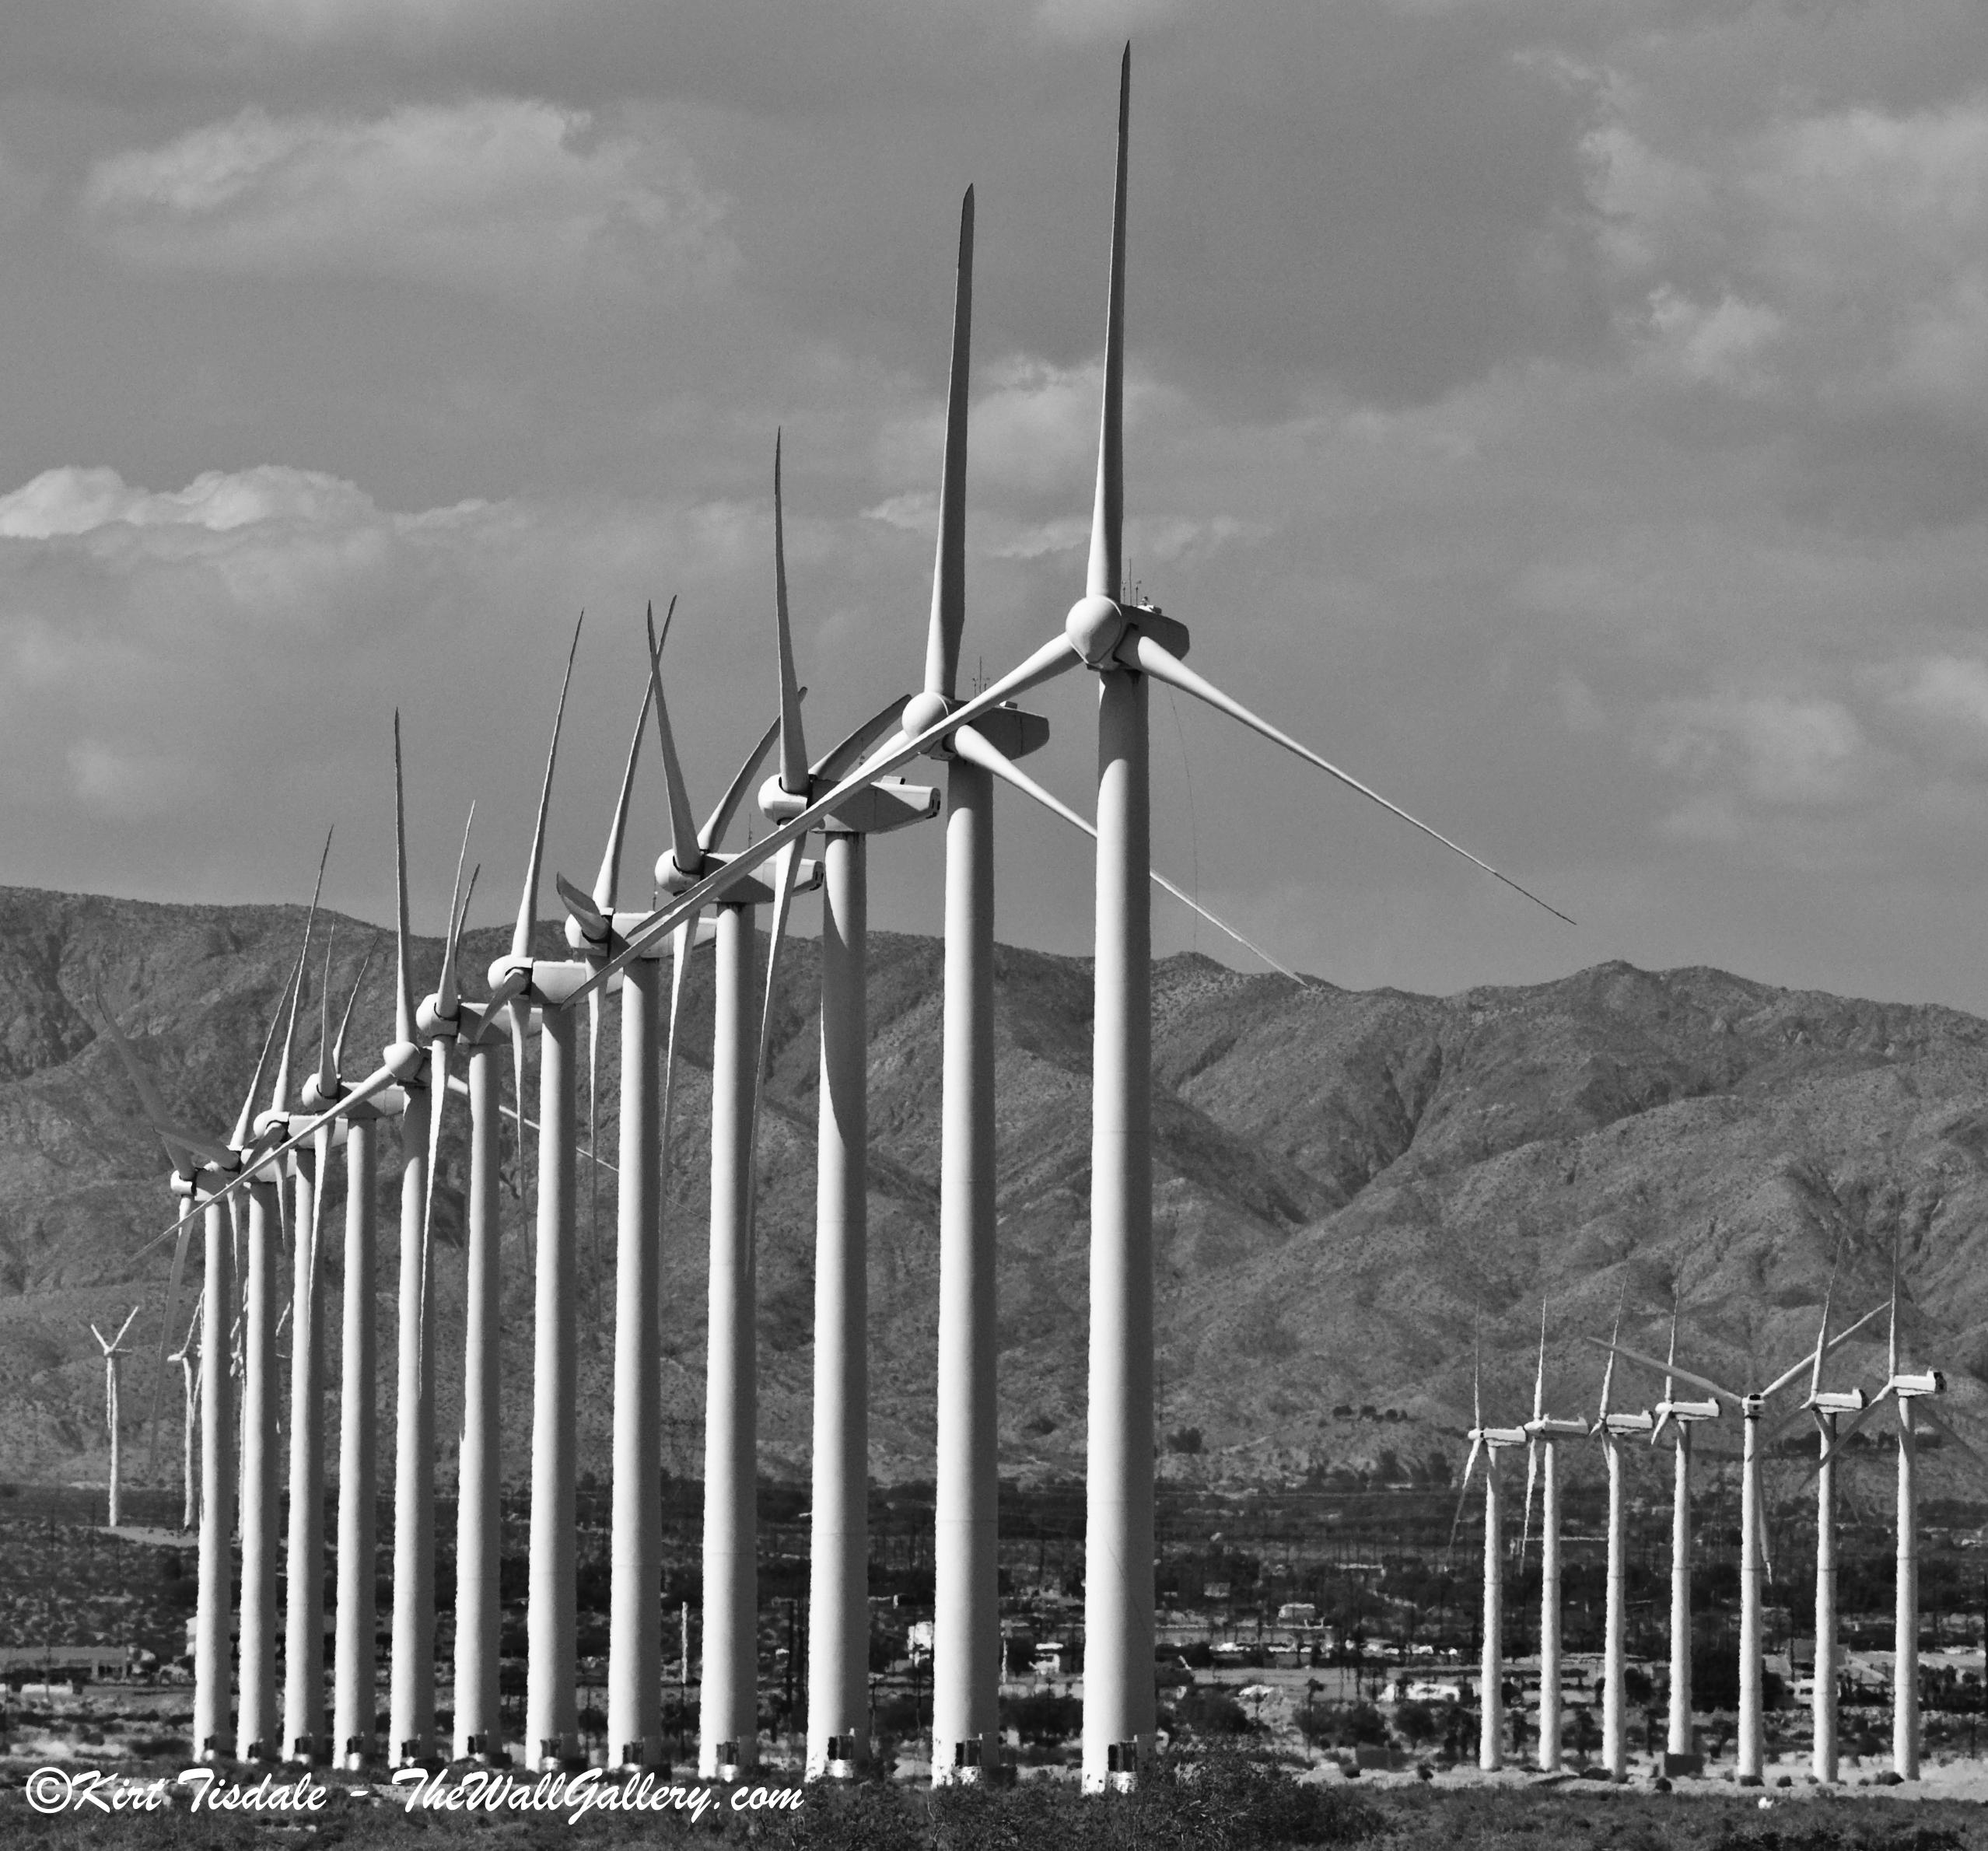 Wind Turbine: Black and White